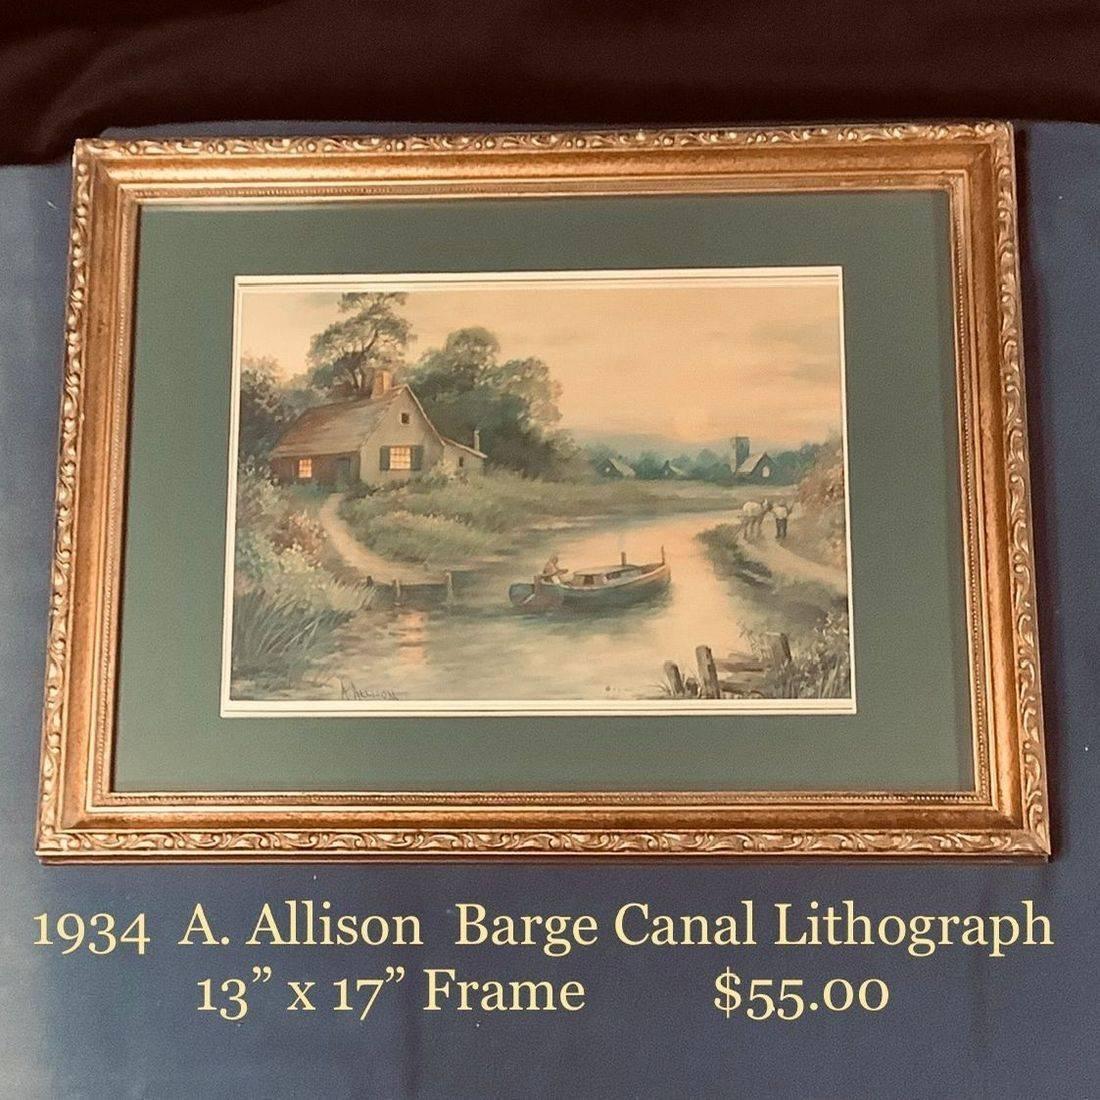 "1934 A. Allison, Barge Canal Litho 13"" X 17""   $55.00"